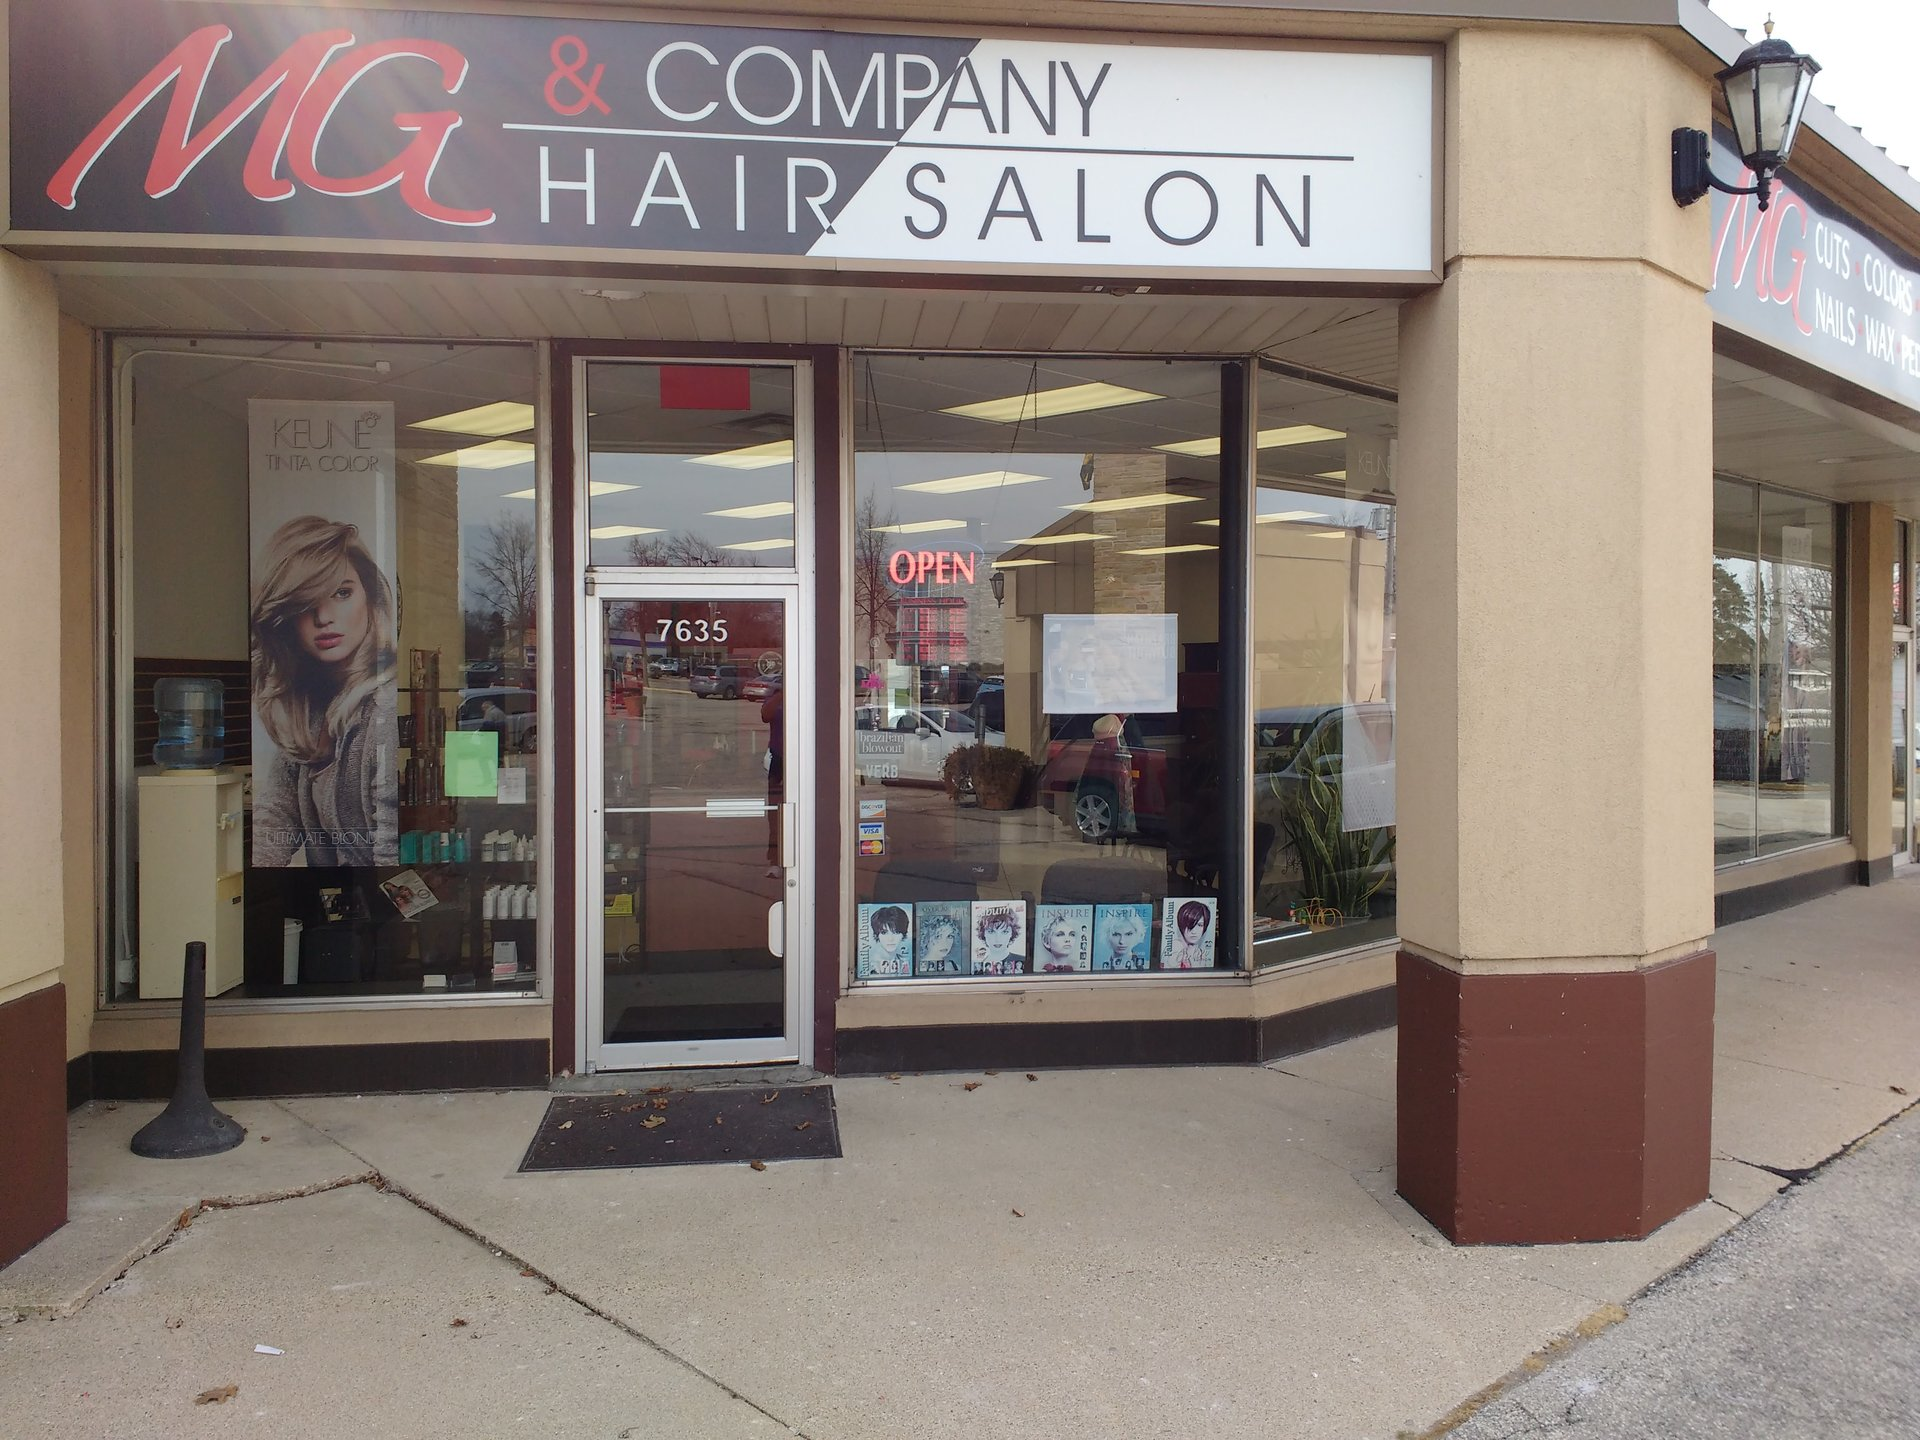 Mg & Company Hair Salon image 2